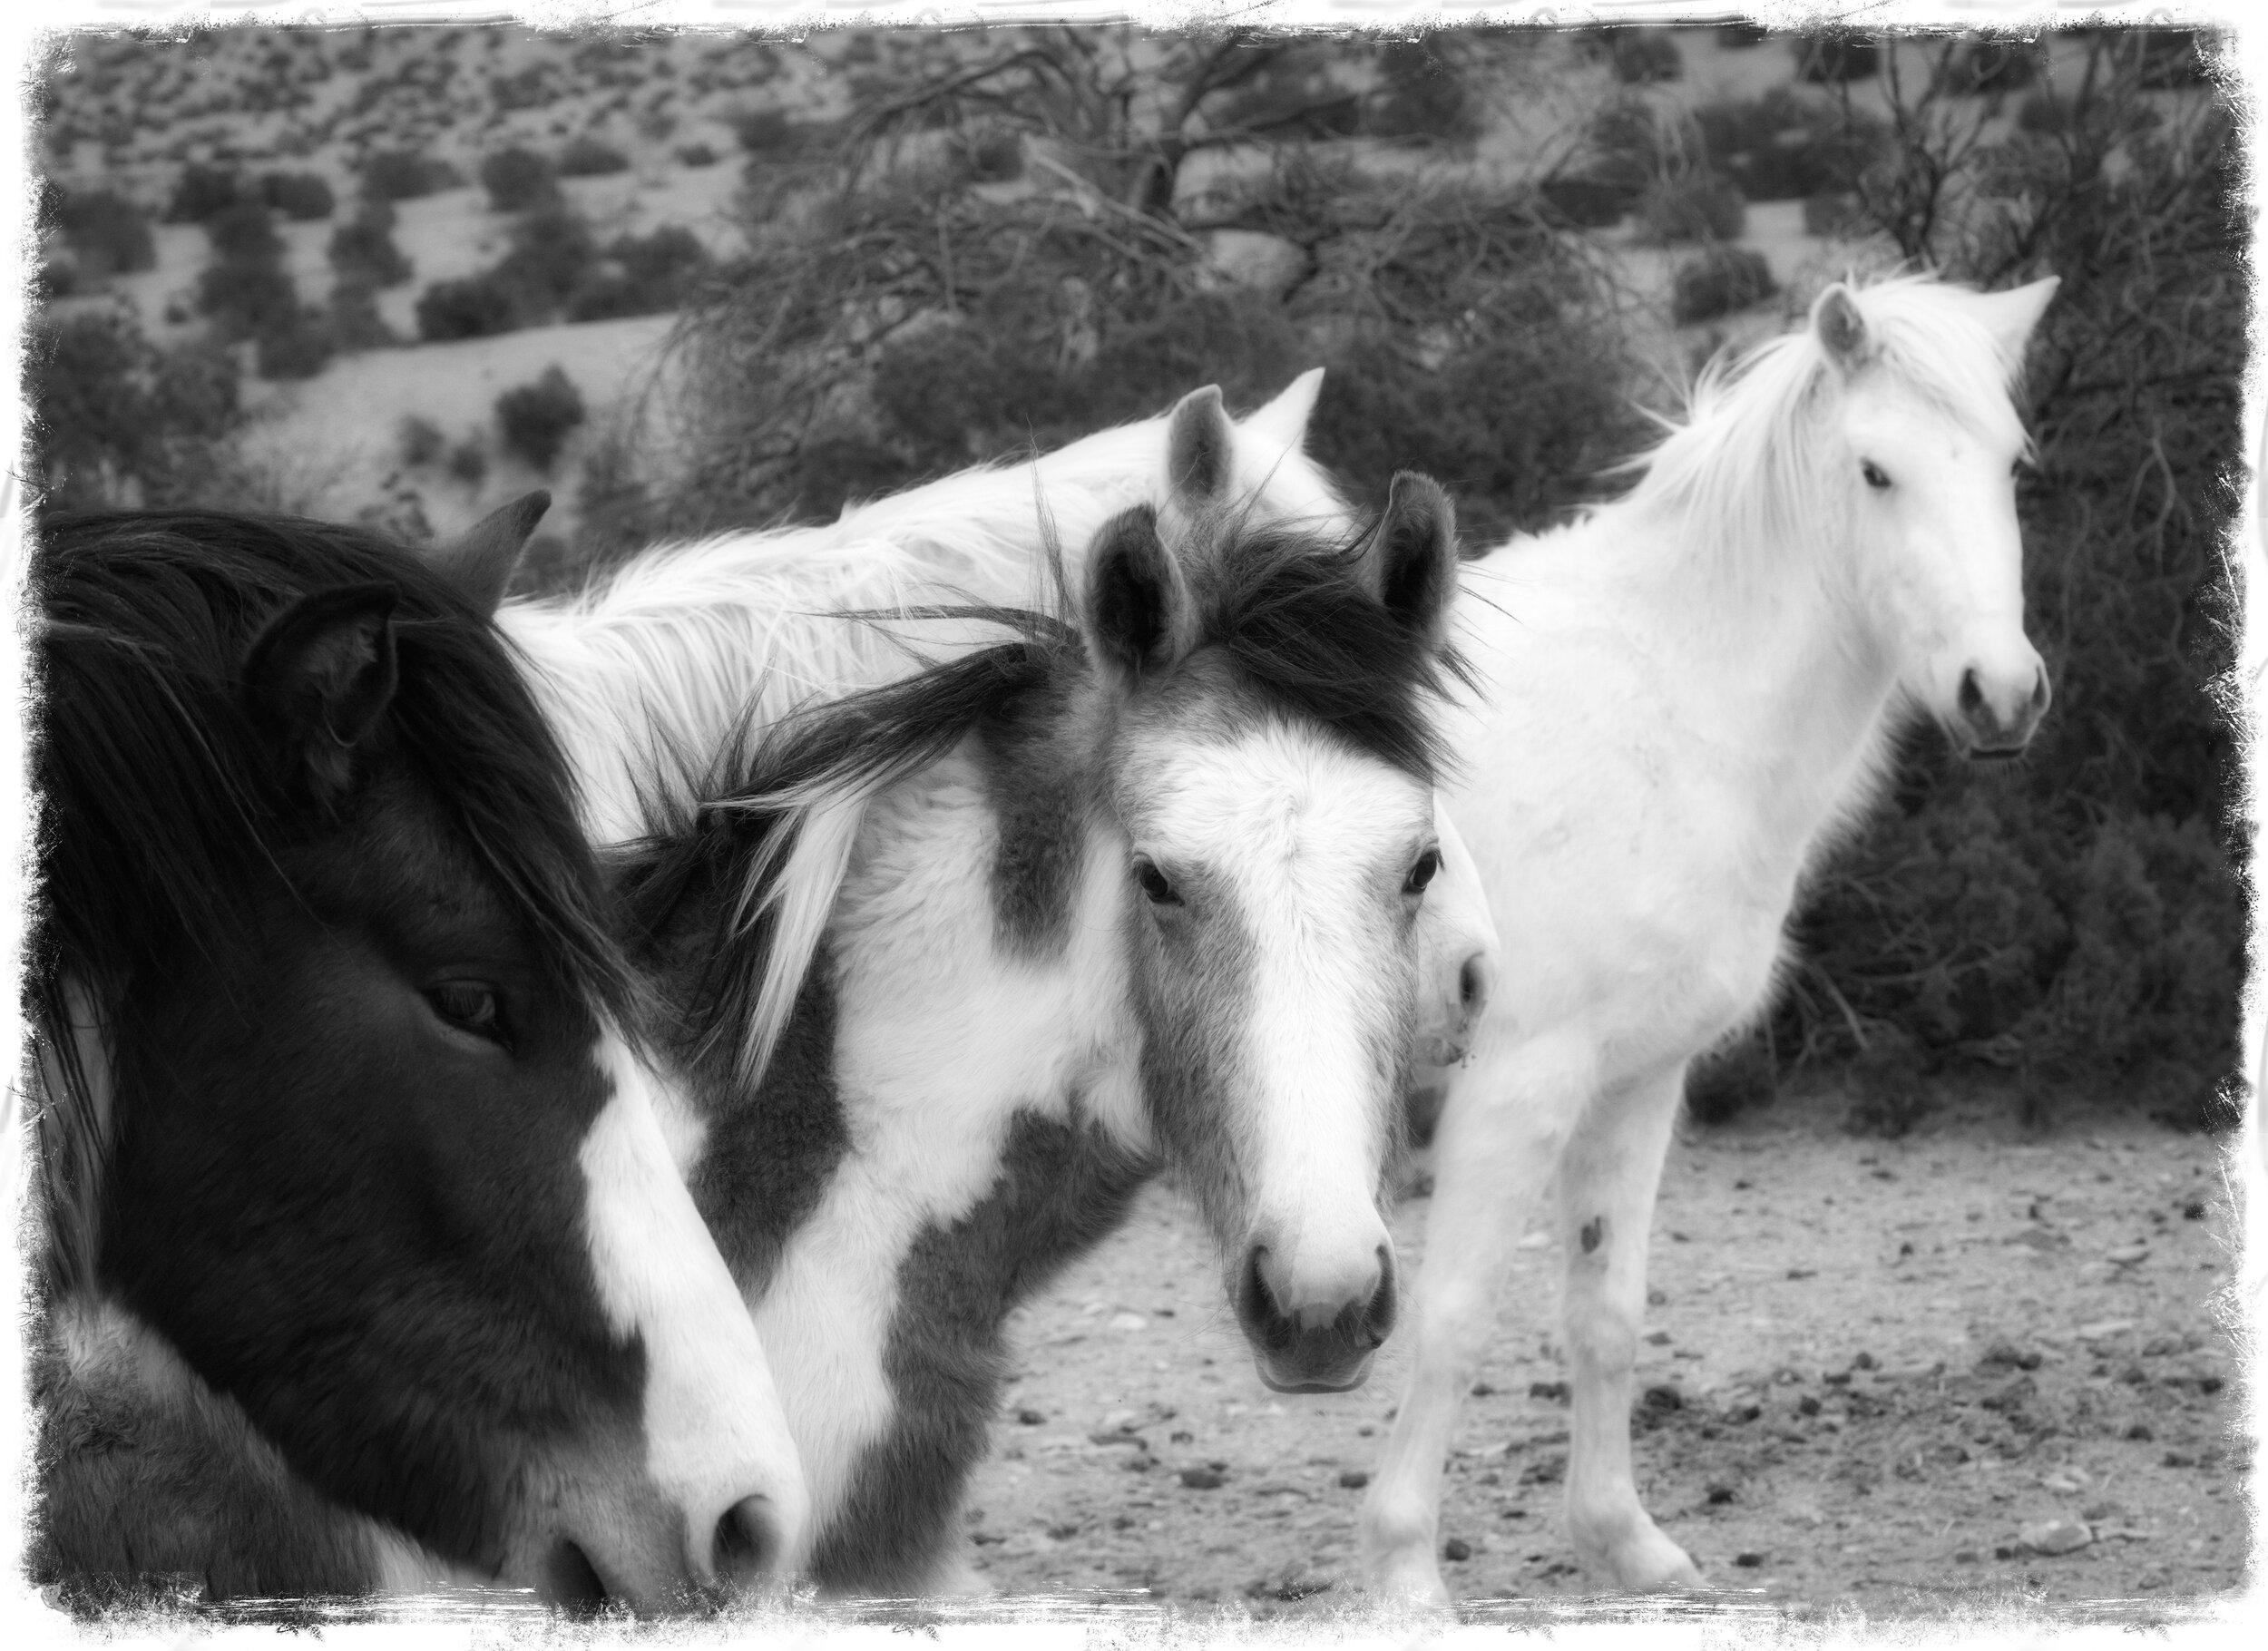 Black And White Wild Horse Photos John Boland Photography